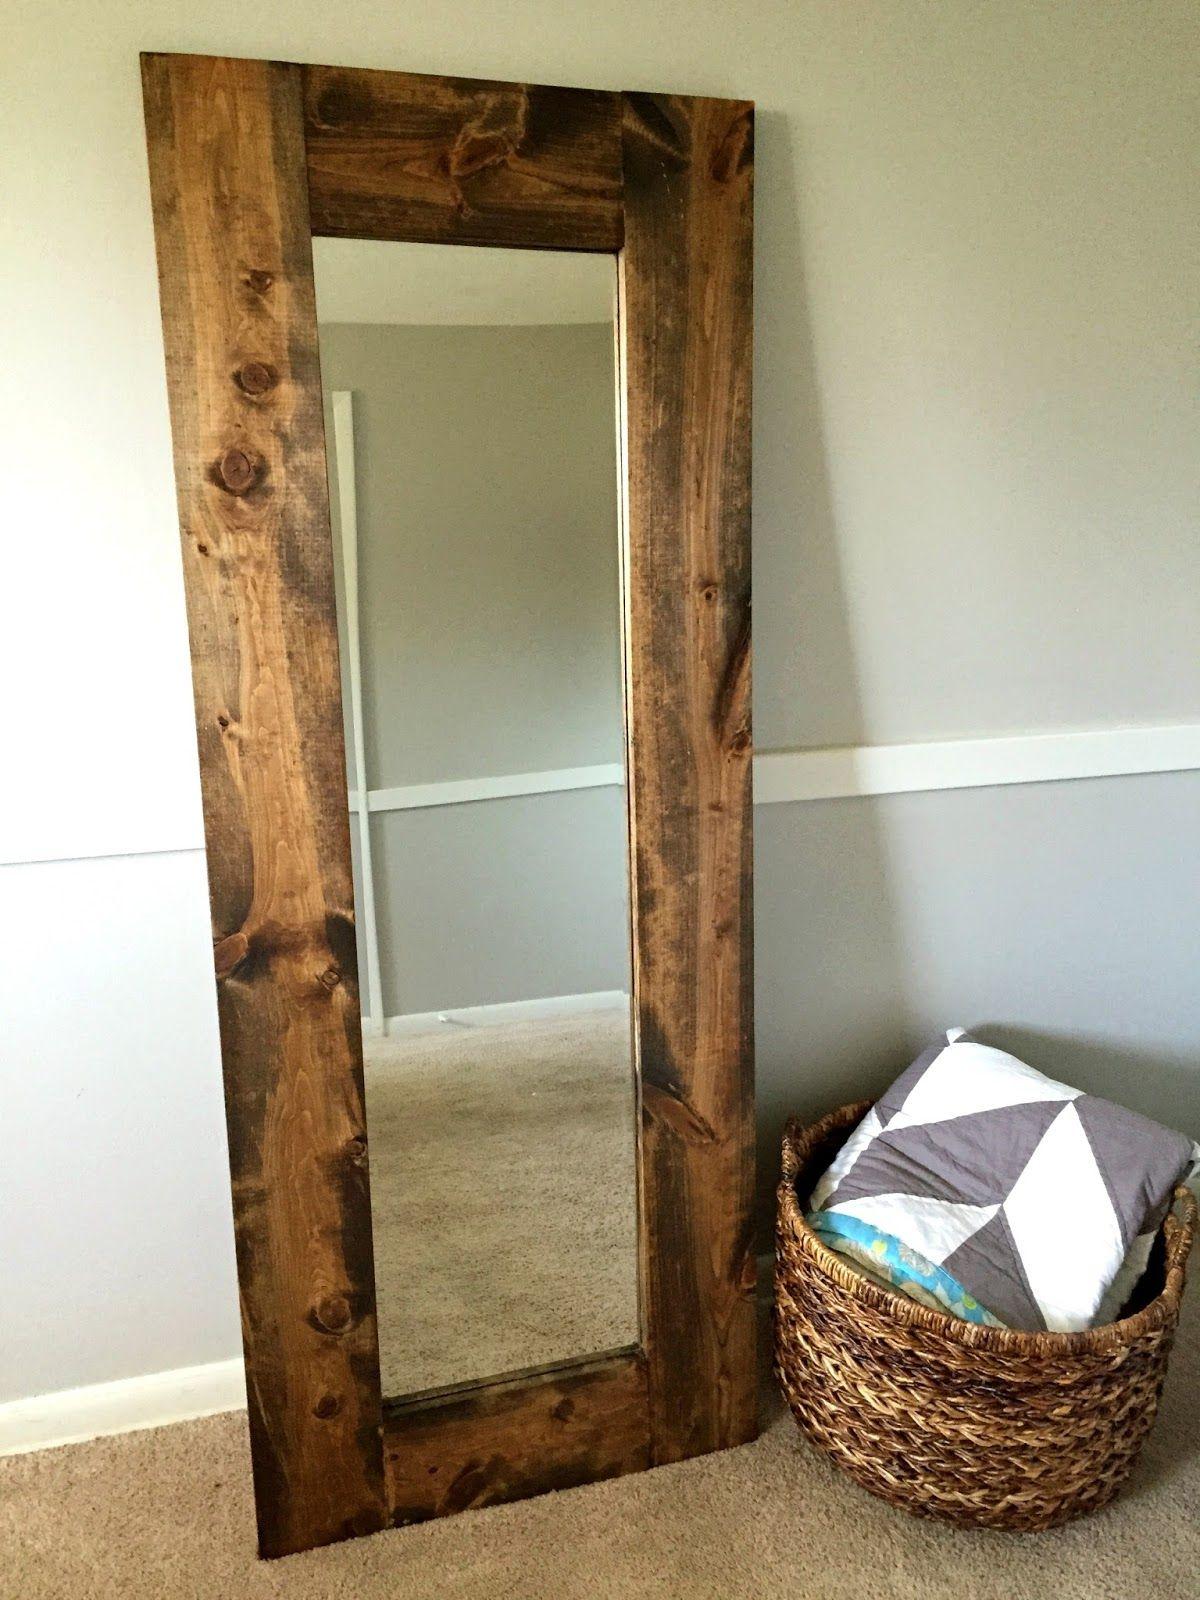 Materials: frameless door mirror here 2 - at 6 feet long 1 piece of backing  mirror adhesive wood glue drill and pocke. - Materials: Frameless Door Mirror Here 2 - 1x6 At 6 Feet Long 1